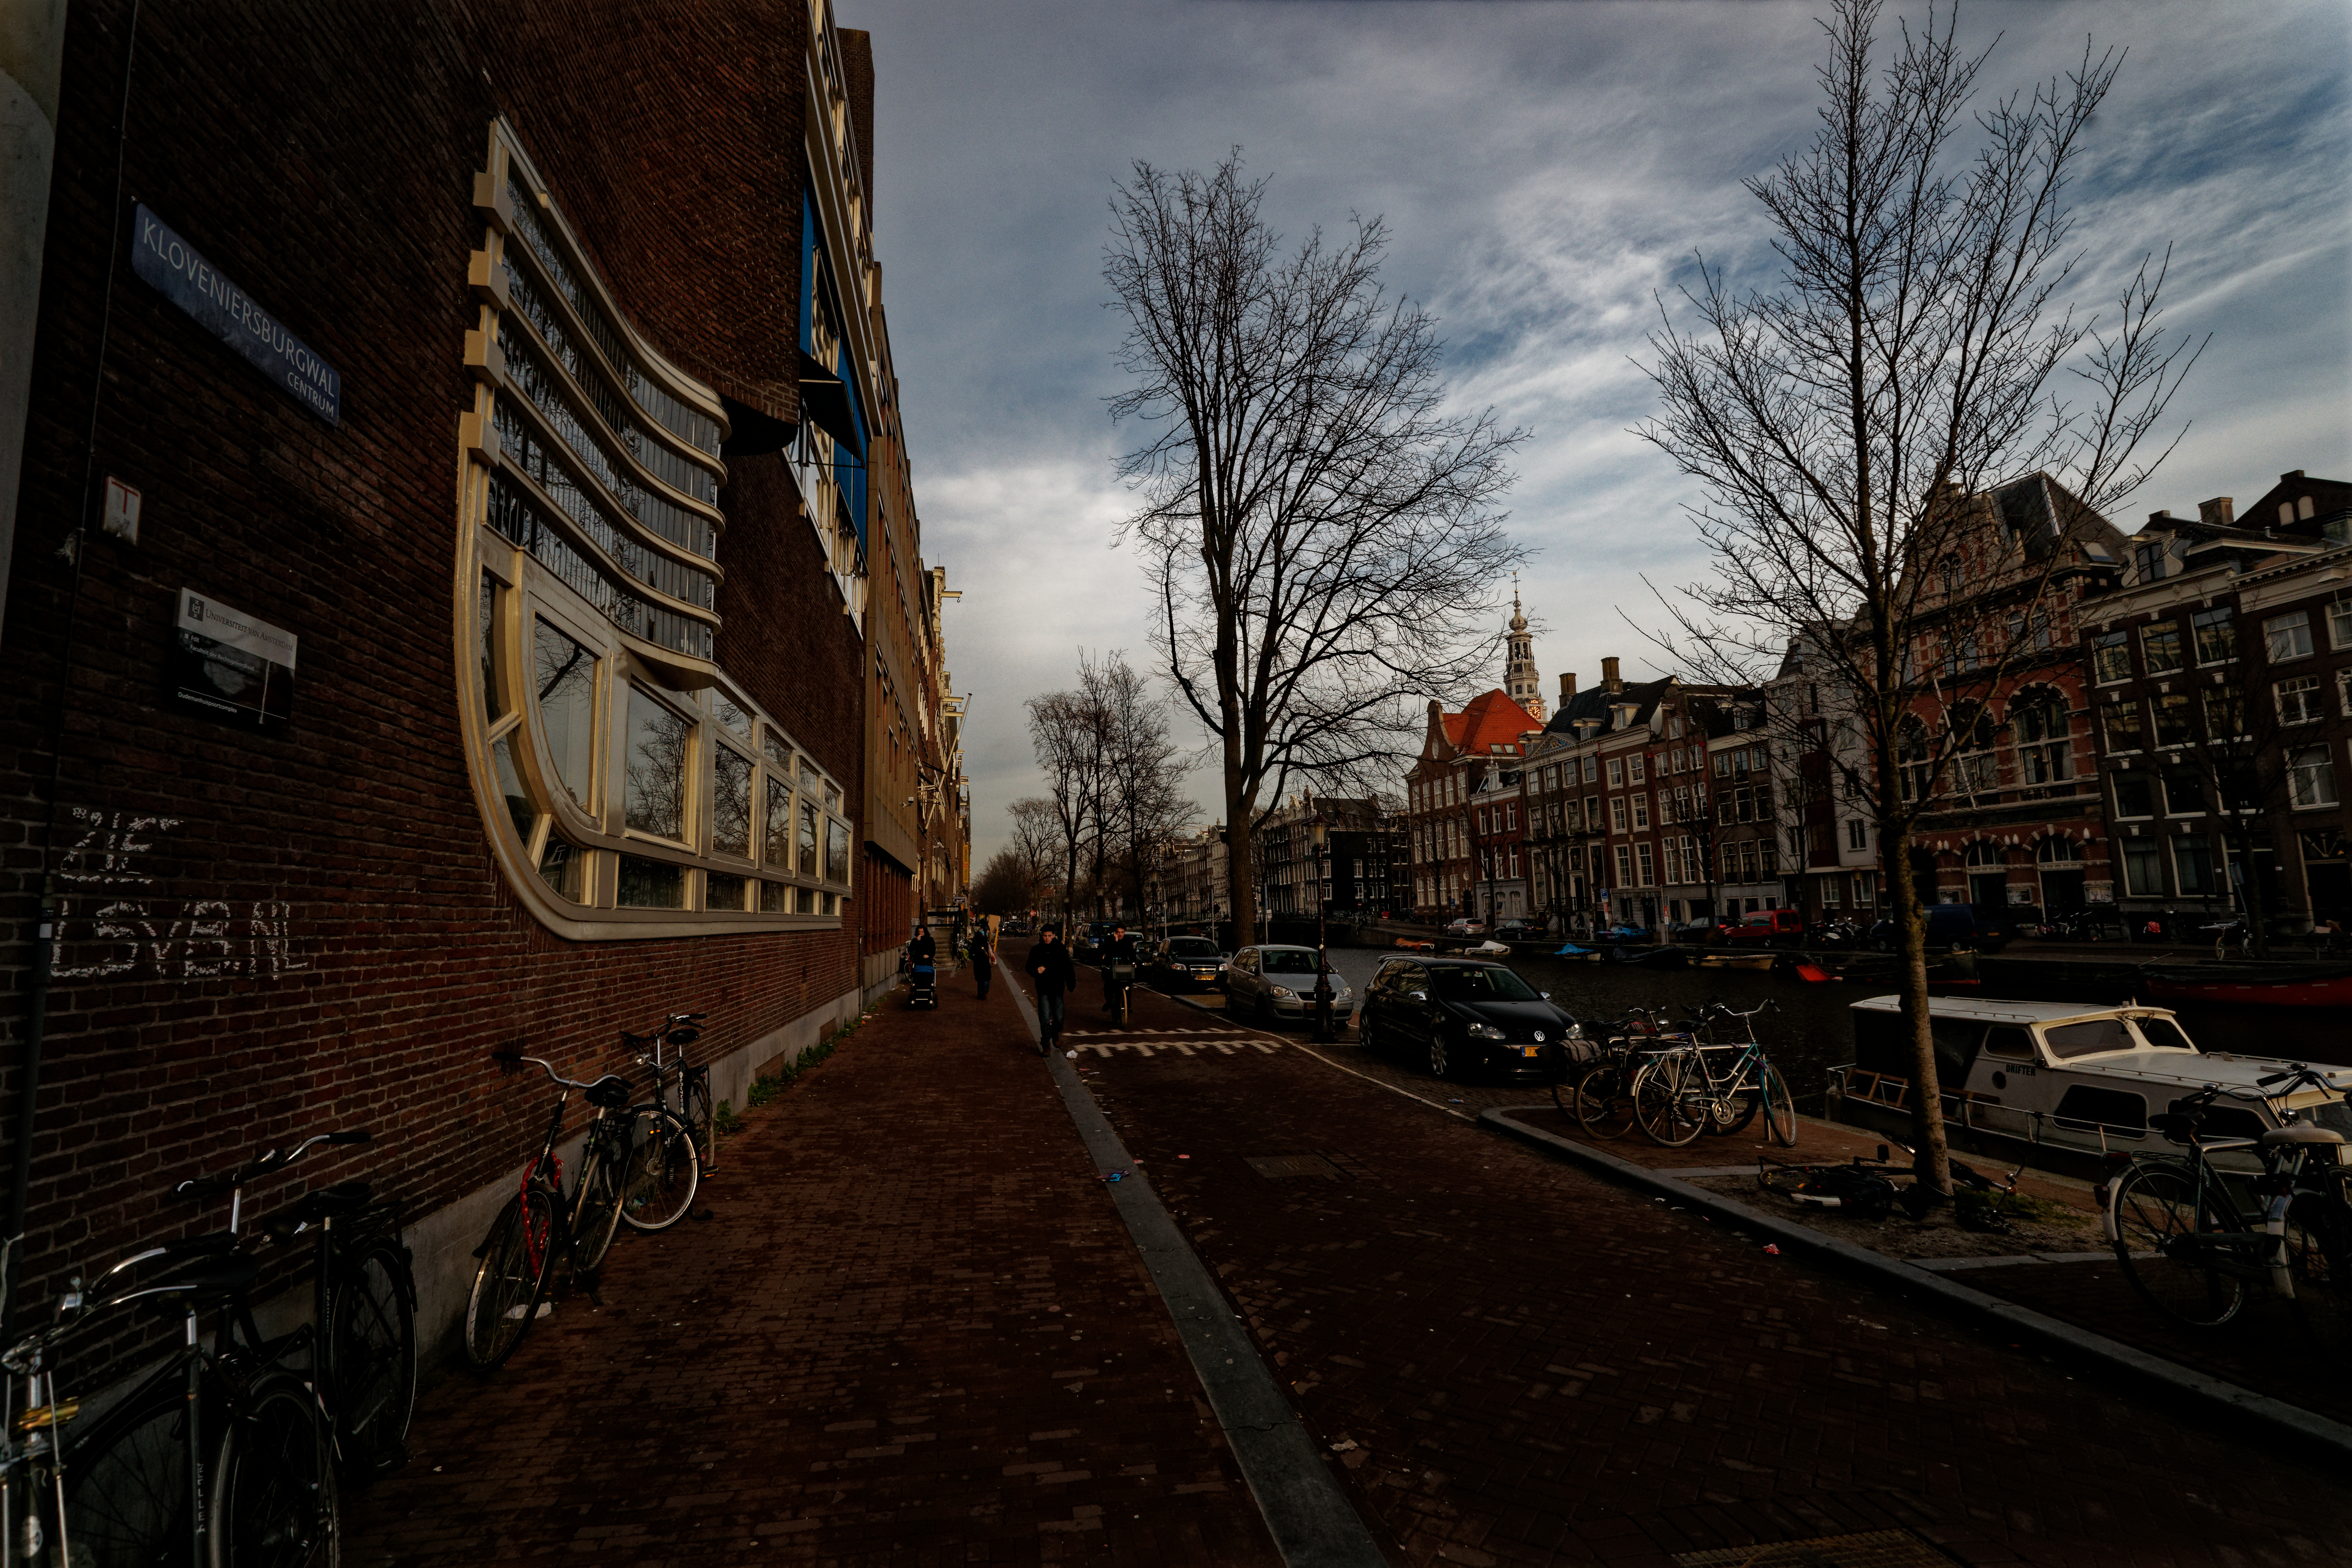 File:Amsterdam - Kloveniersburgwal - View NNE along